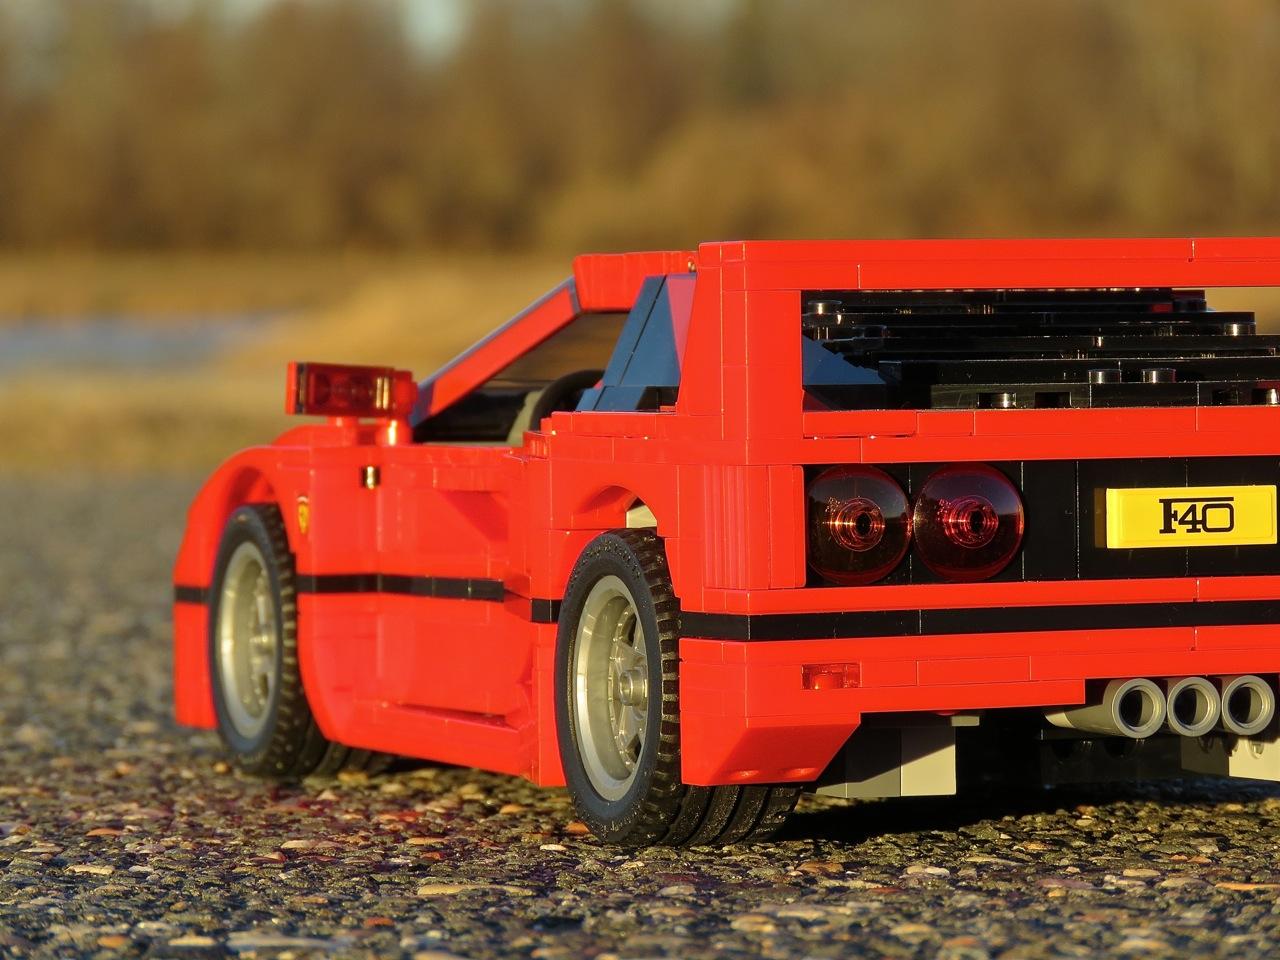 Lego Ferrari F40 4